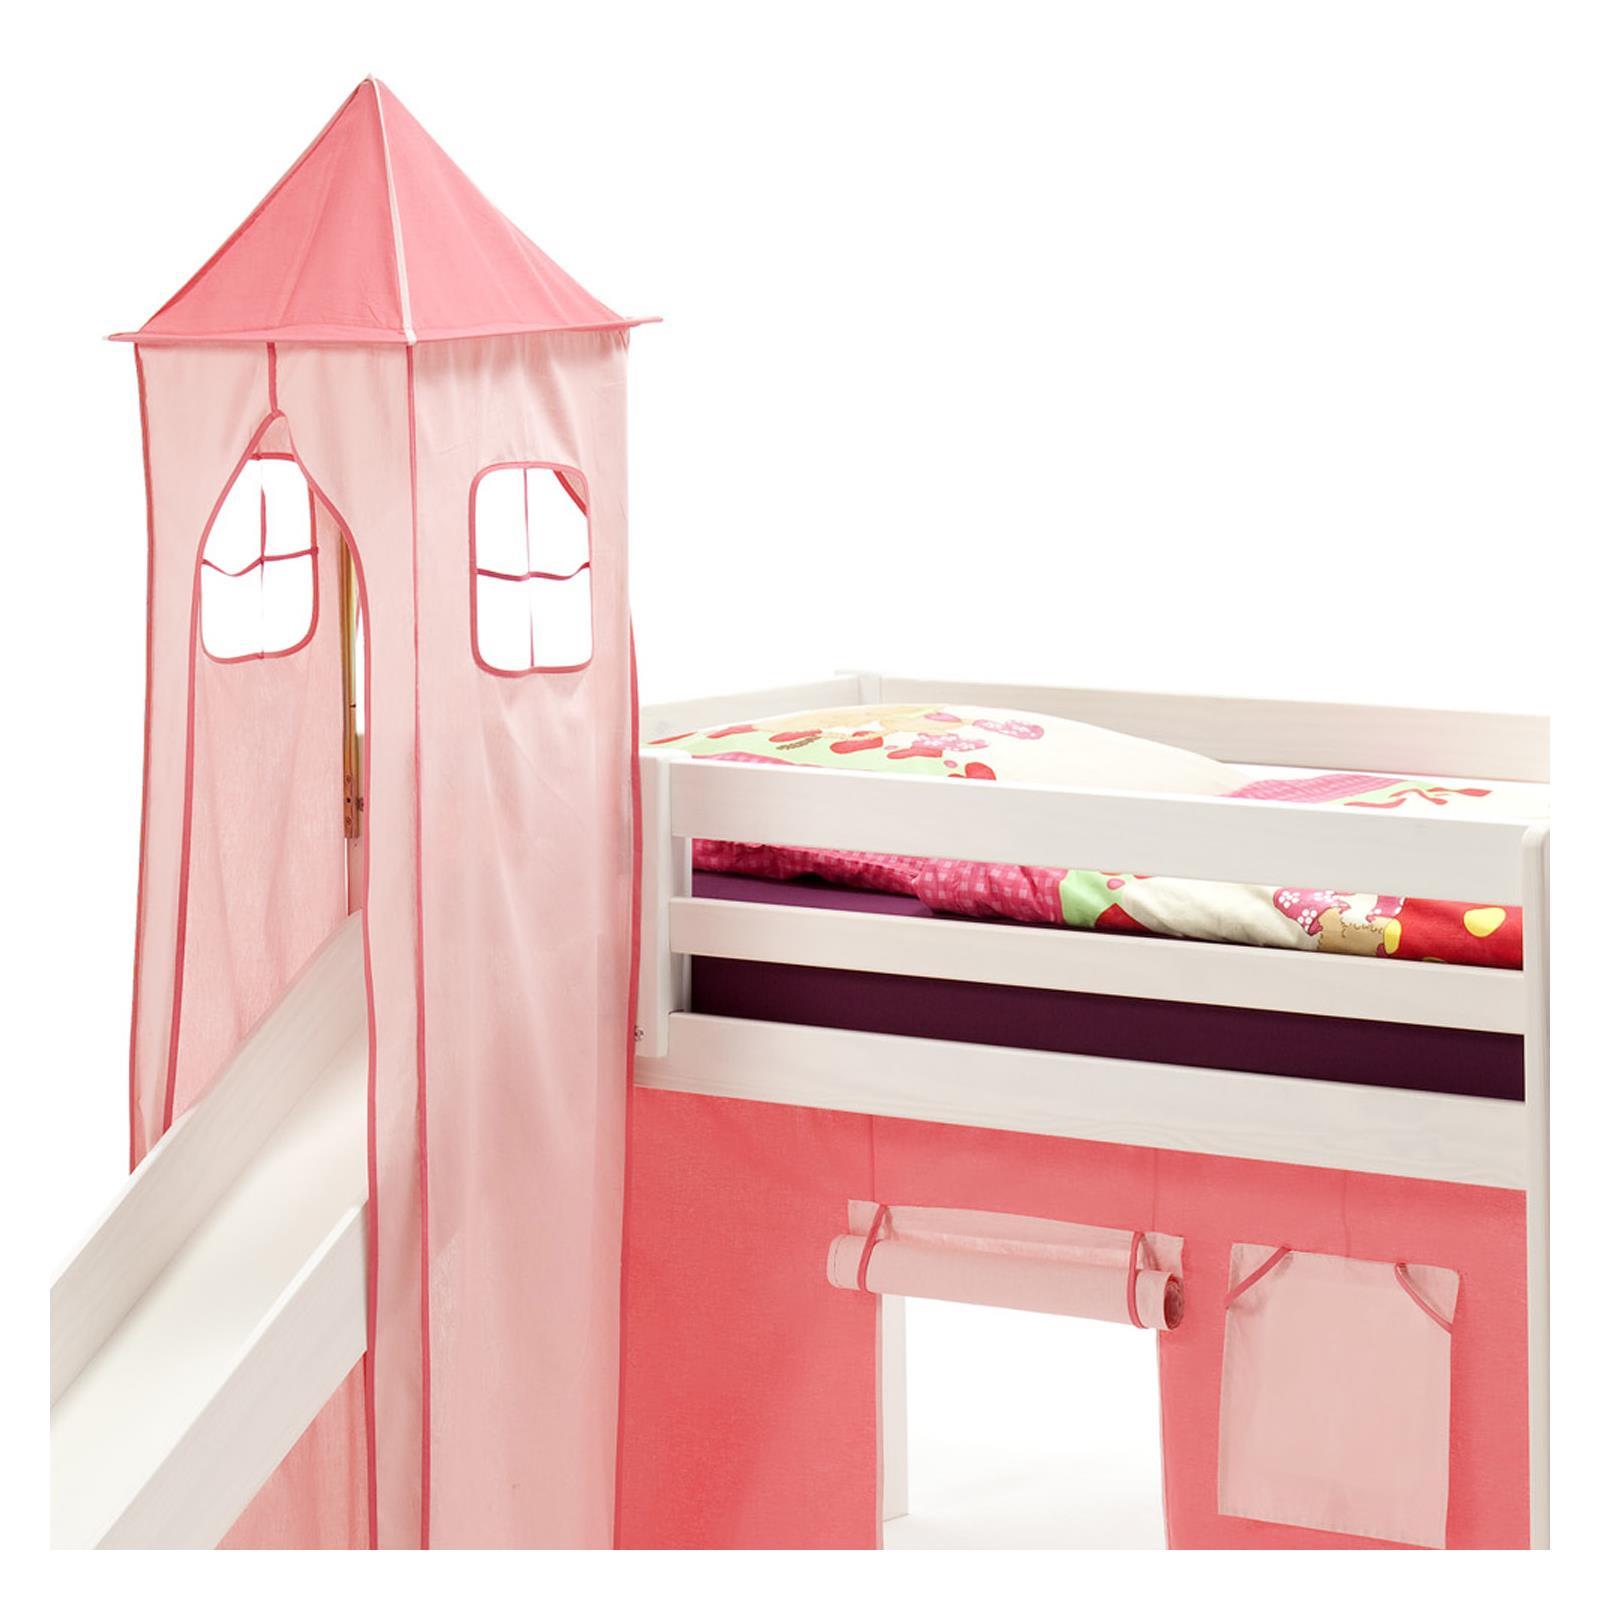 donjon max pour lit sur lev avec toboggan rose mobil meubles. Black Bedroom Furniture Sets. Home Design Ideas